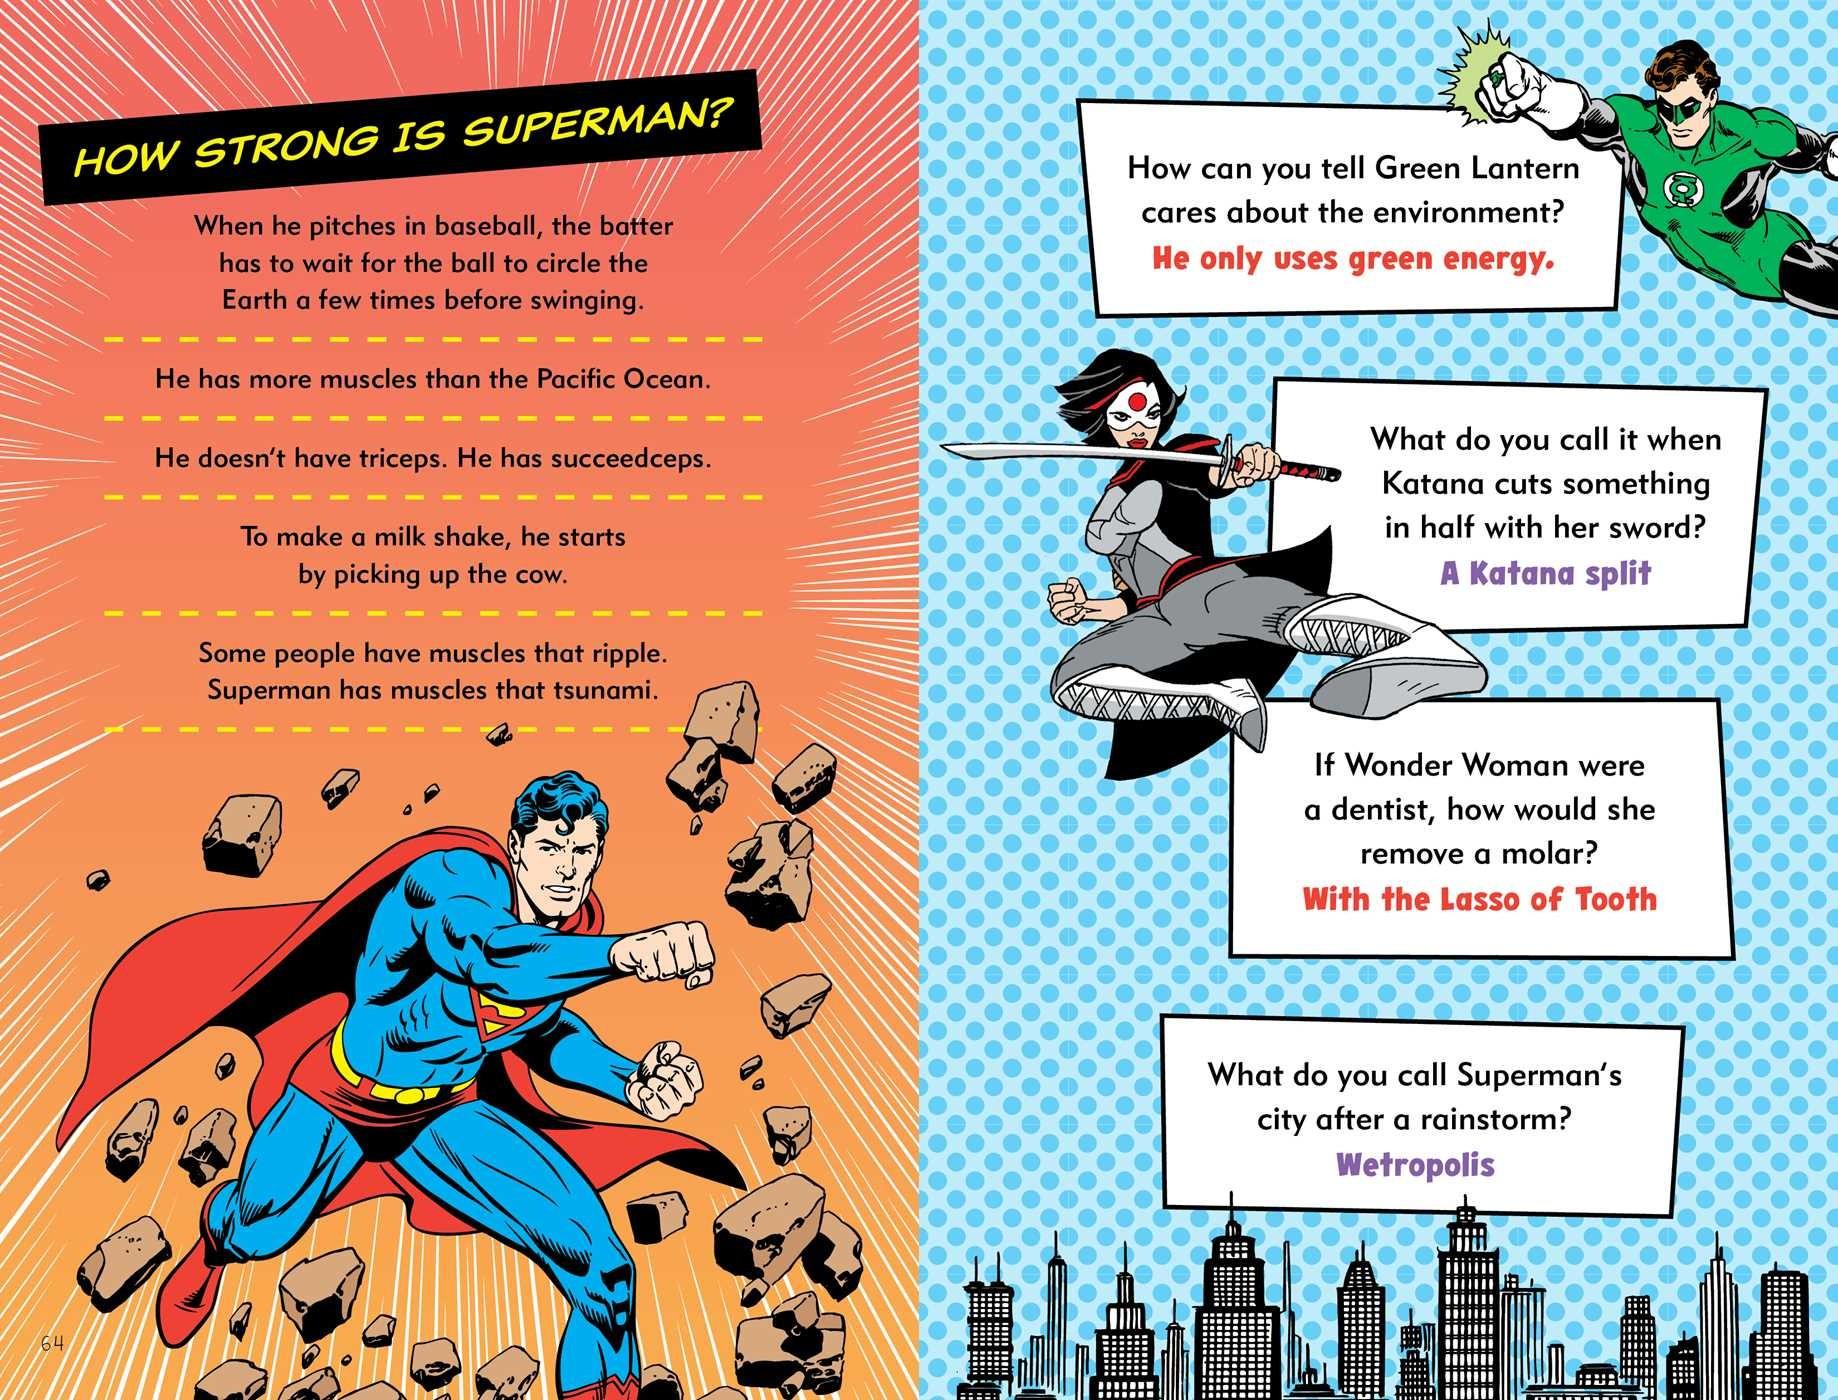 The official dc super hero joke book 9781941367339.in02